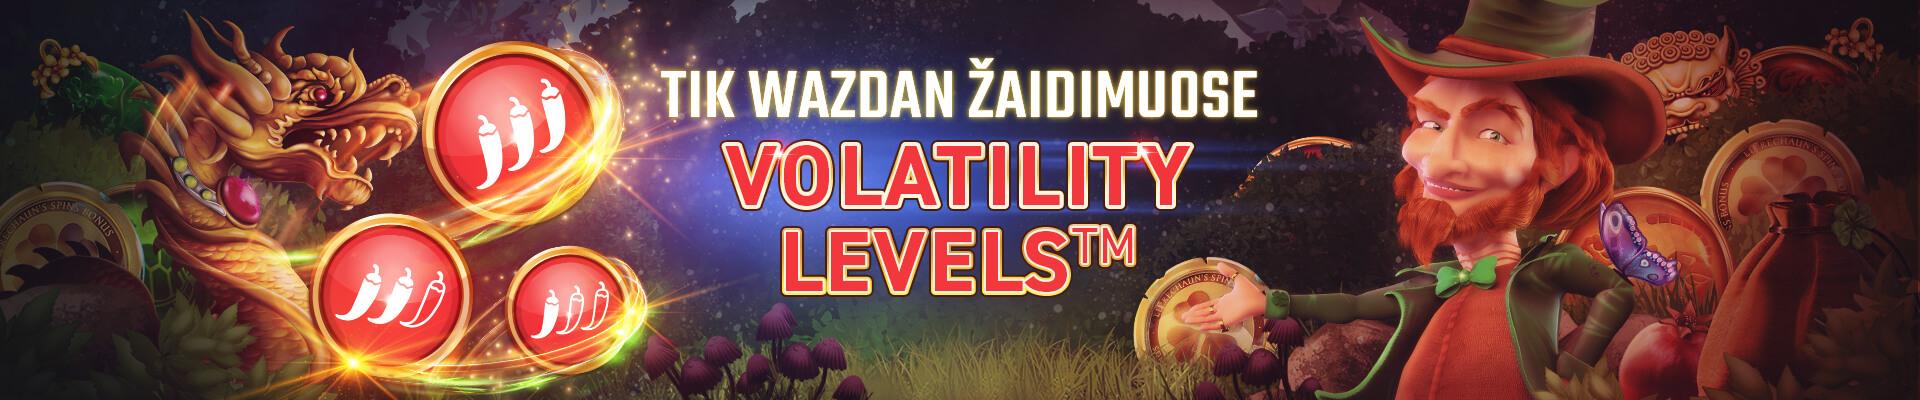 Wazdan volatility levels